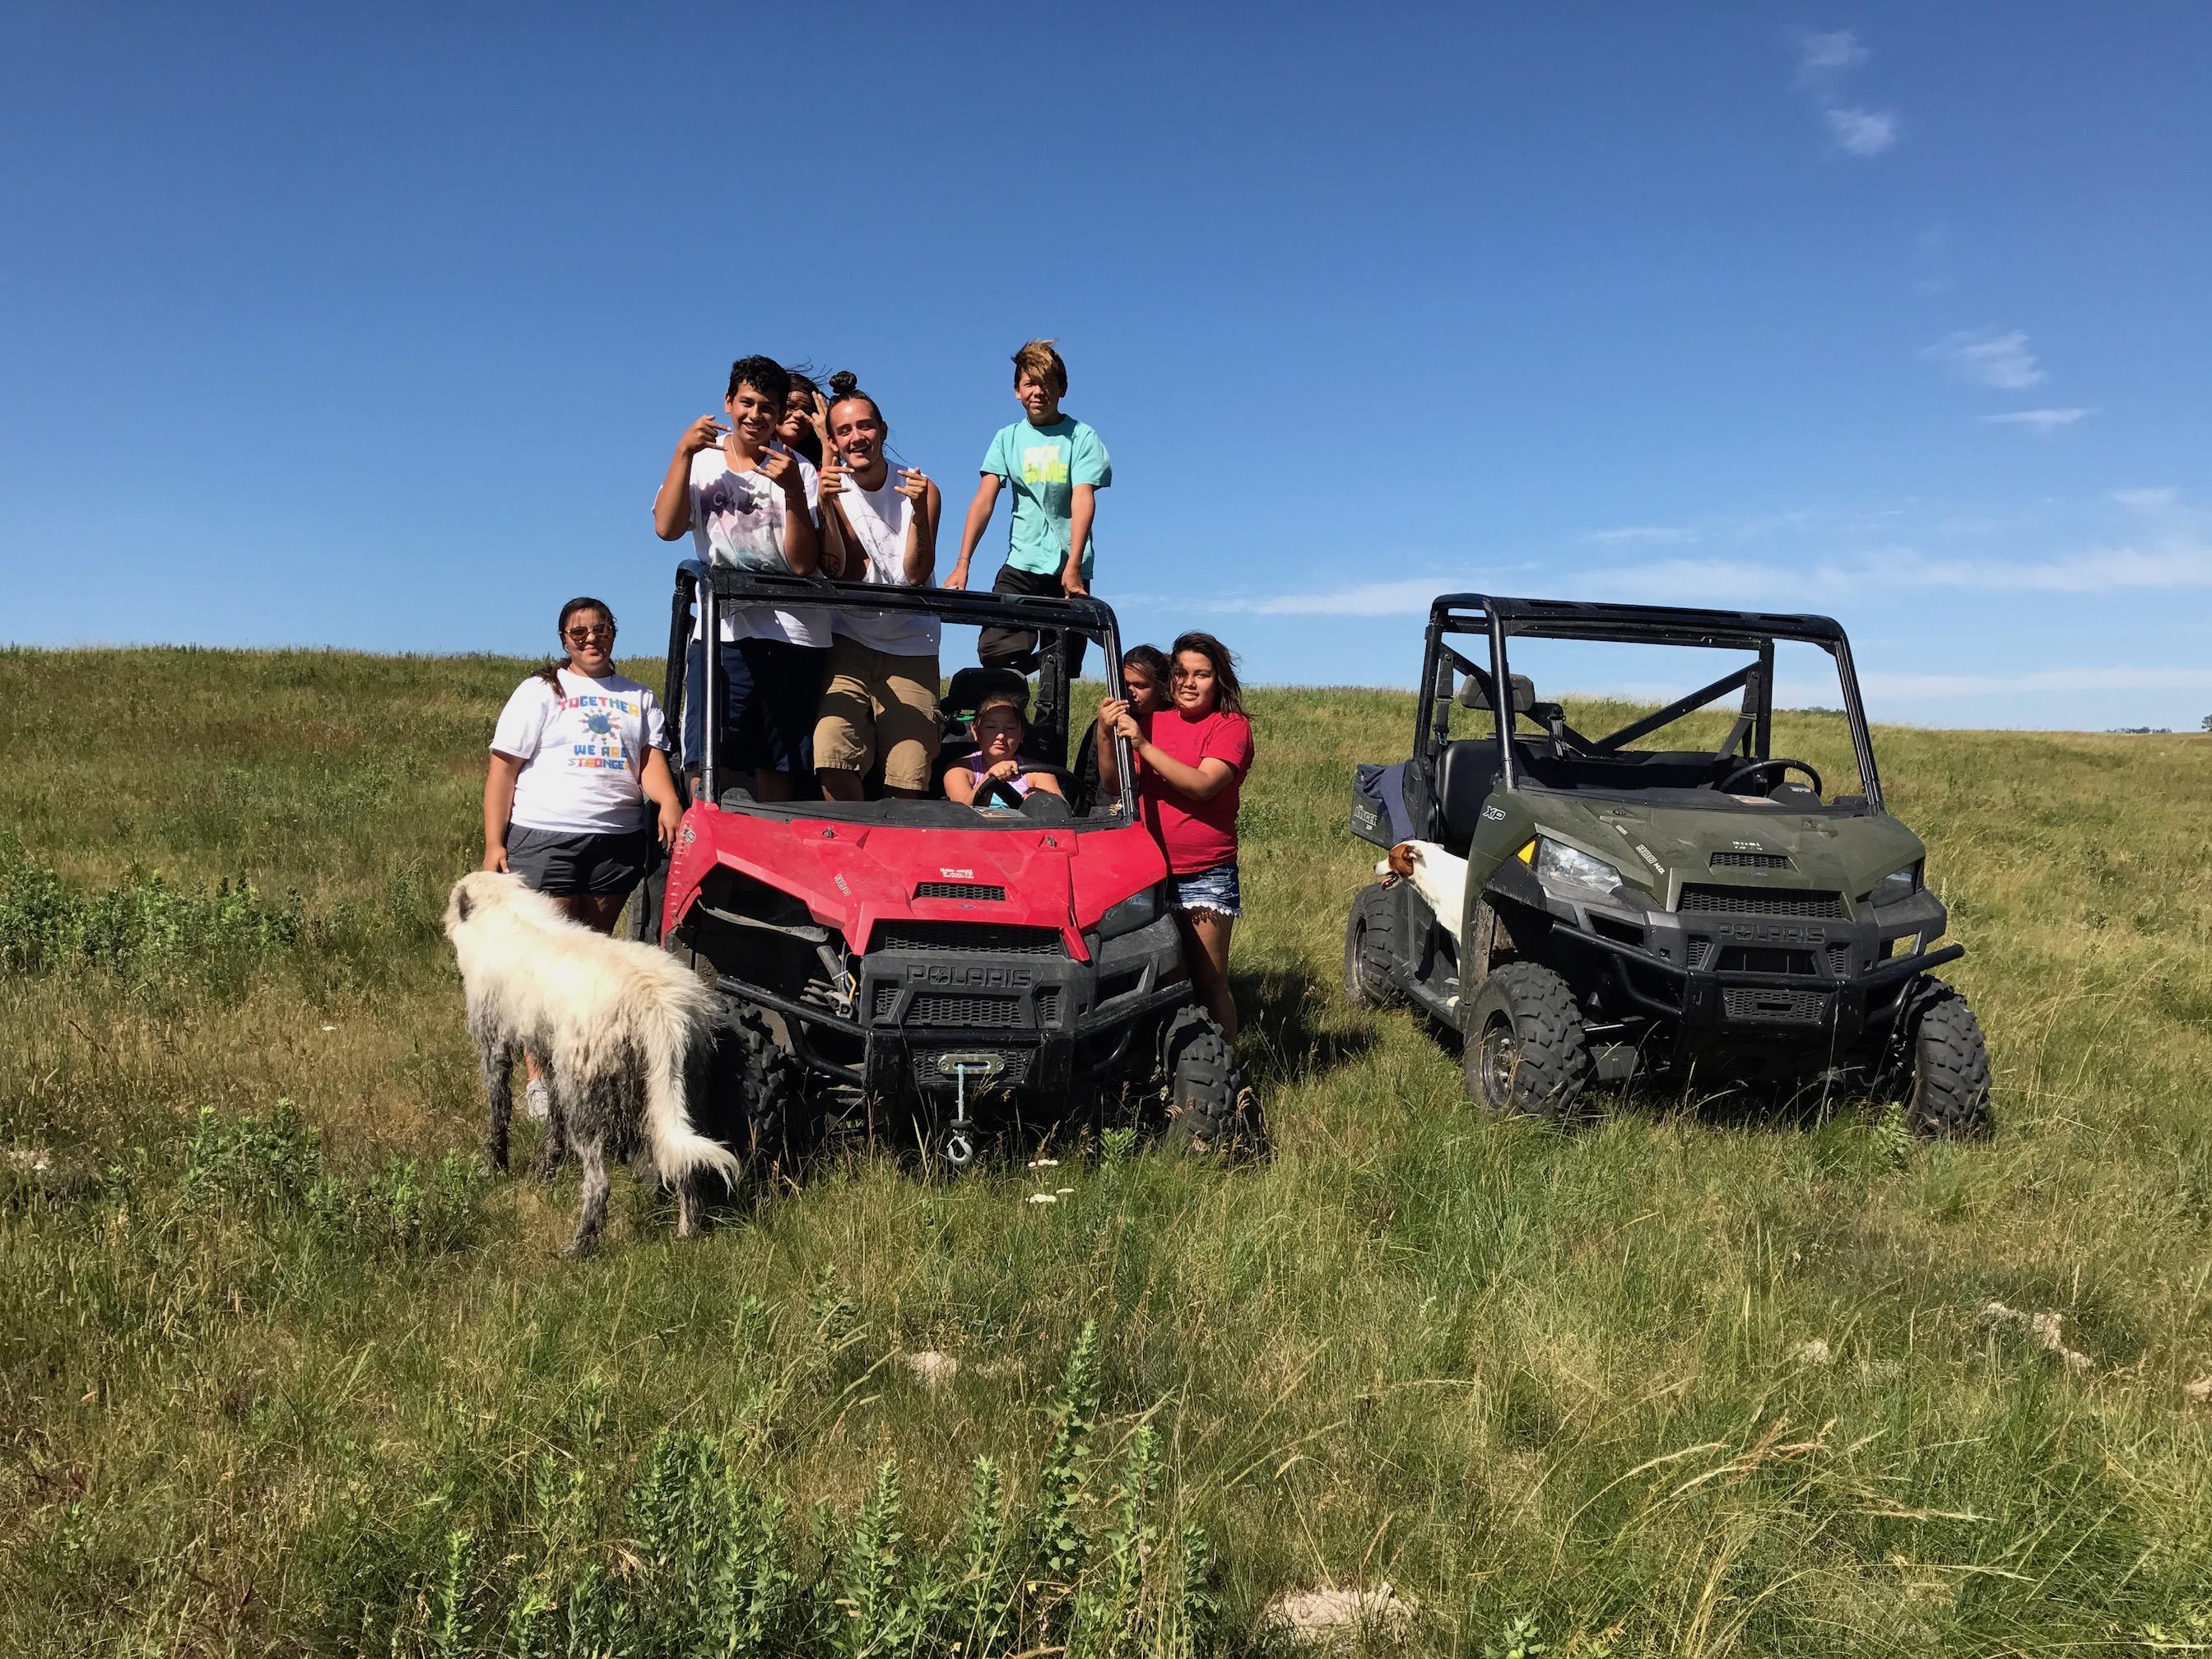 Photo Credit: Megan Eisenfelder, CGH Scholar 2017, Lake Traverse Reservation South Dakota